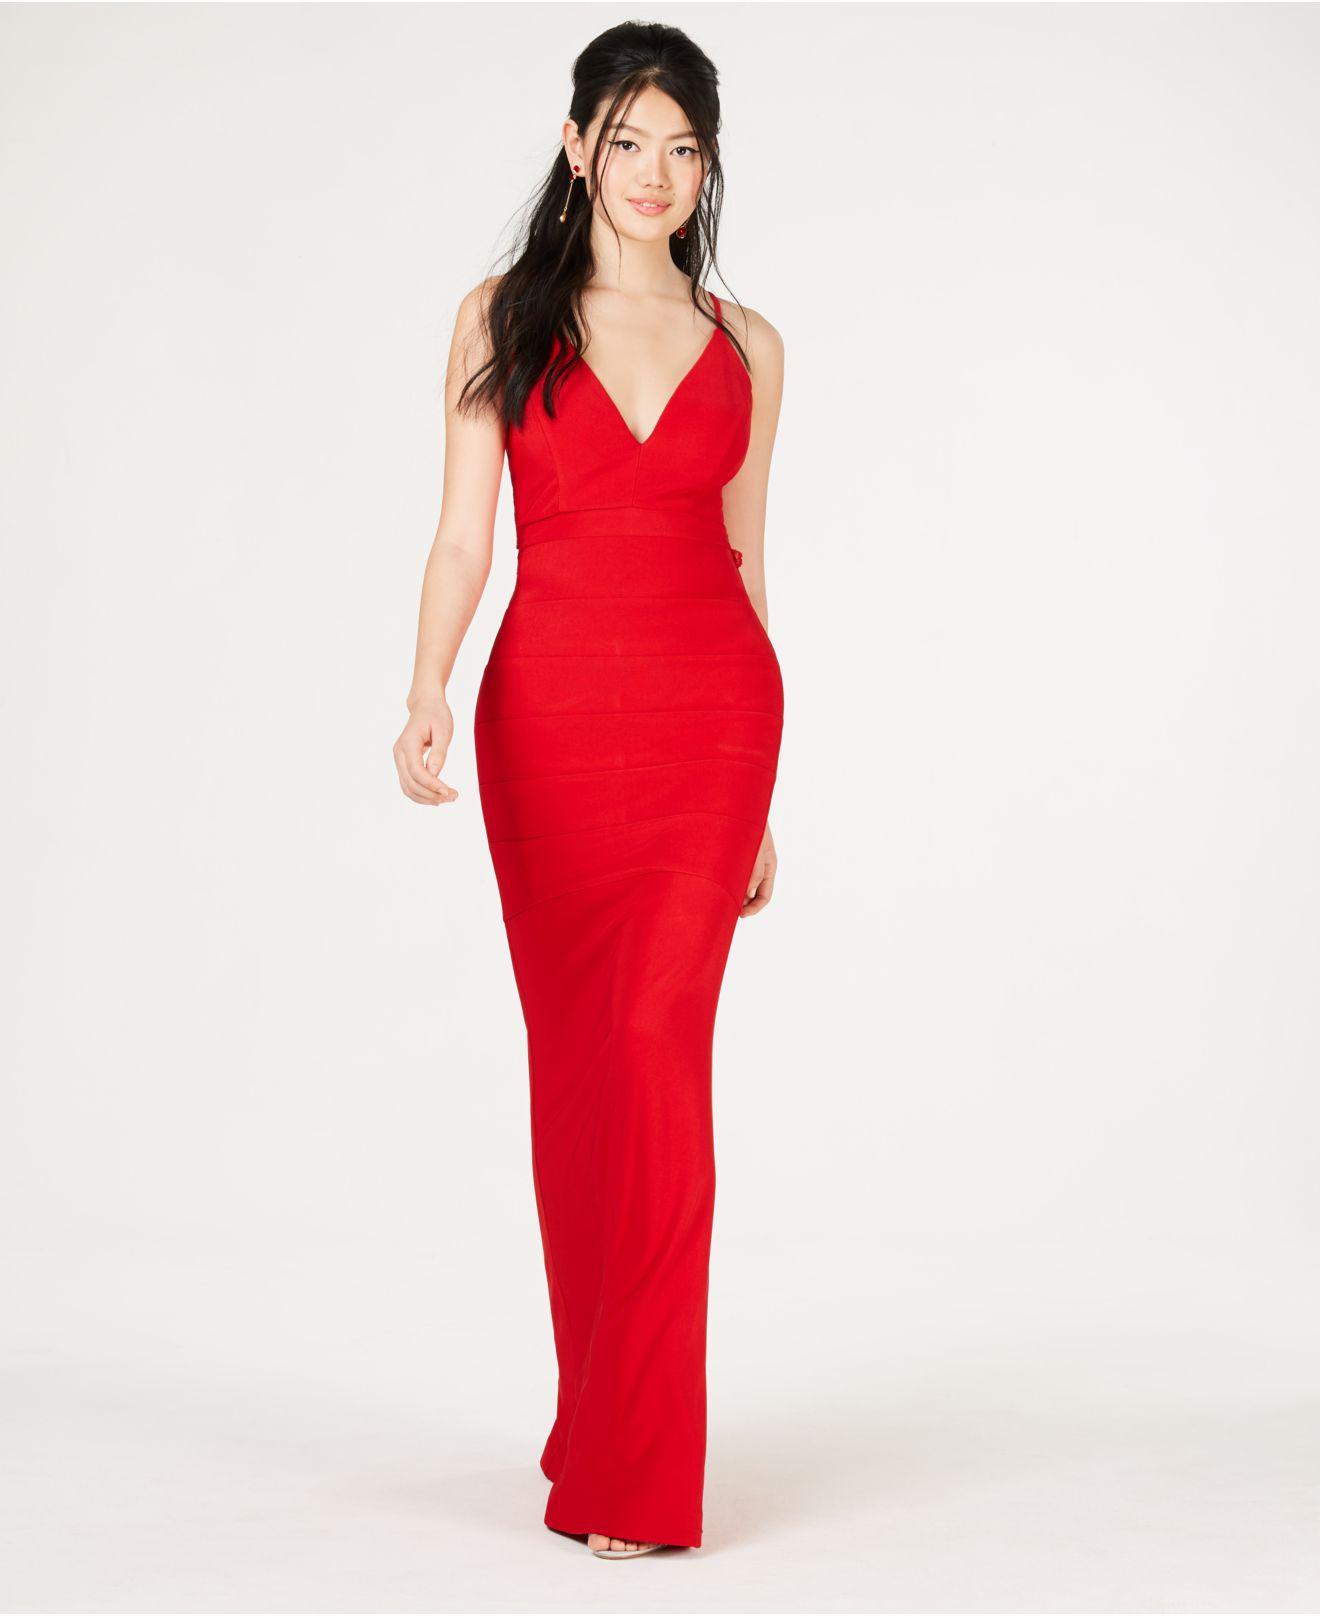 1c1f563b254 Emerald Sundae Juniors  Lace-racerback Gown in Red - Lyst